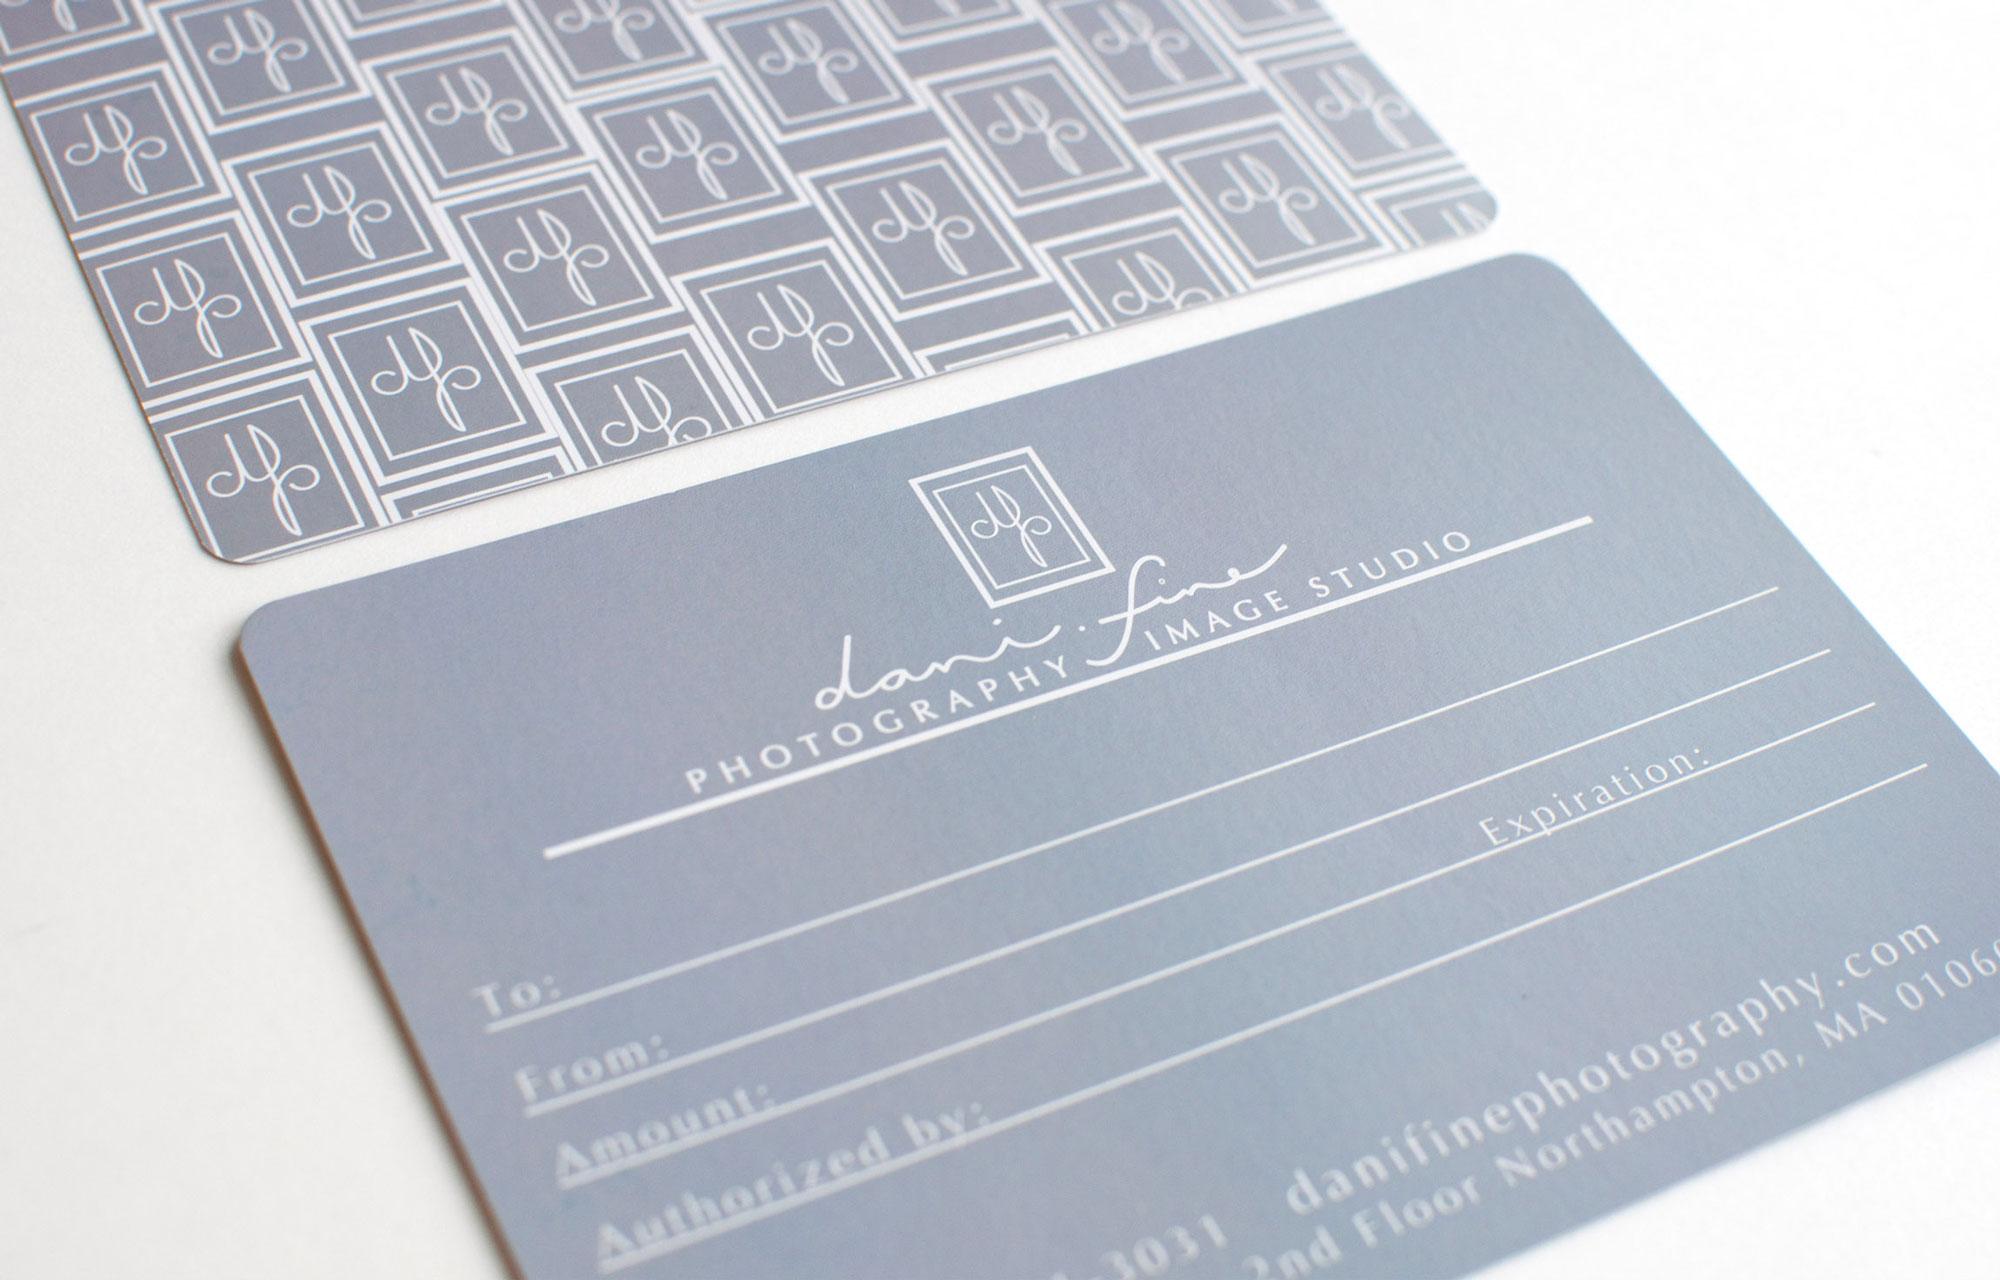 gift certificate design by megan alissa, meganalissa.com